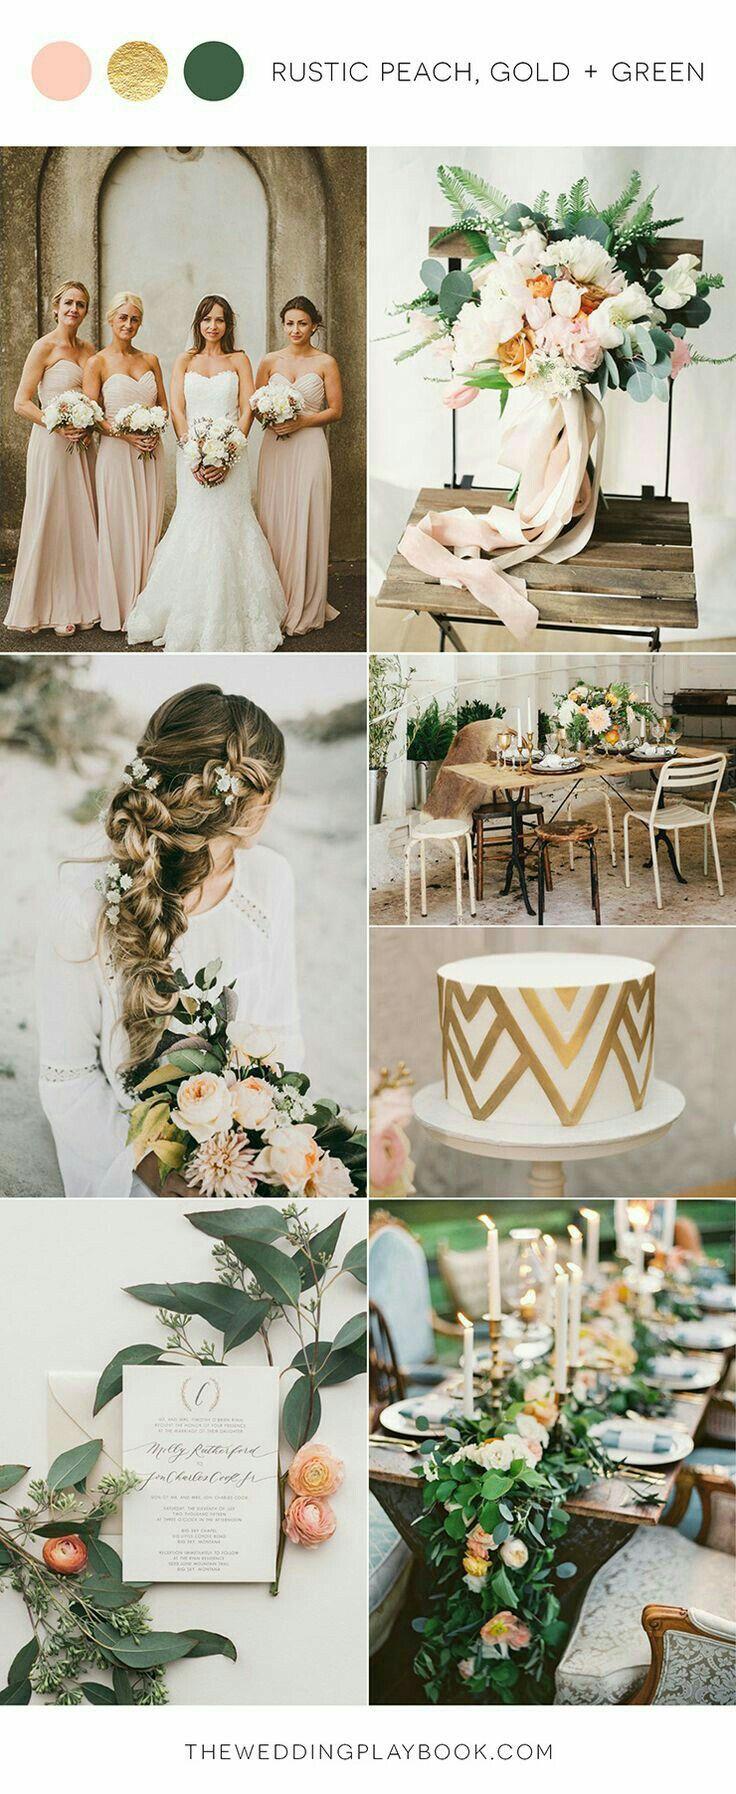 74 best Wedding images on Pinterest | Field wedding, Dream wedding ...